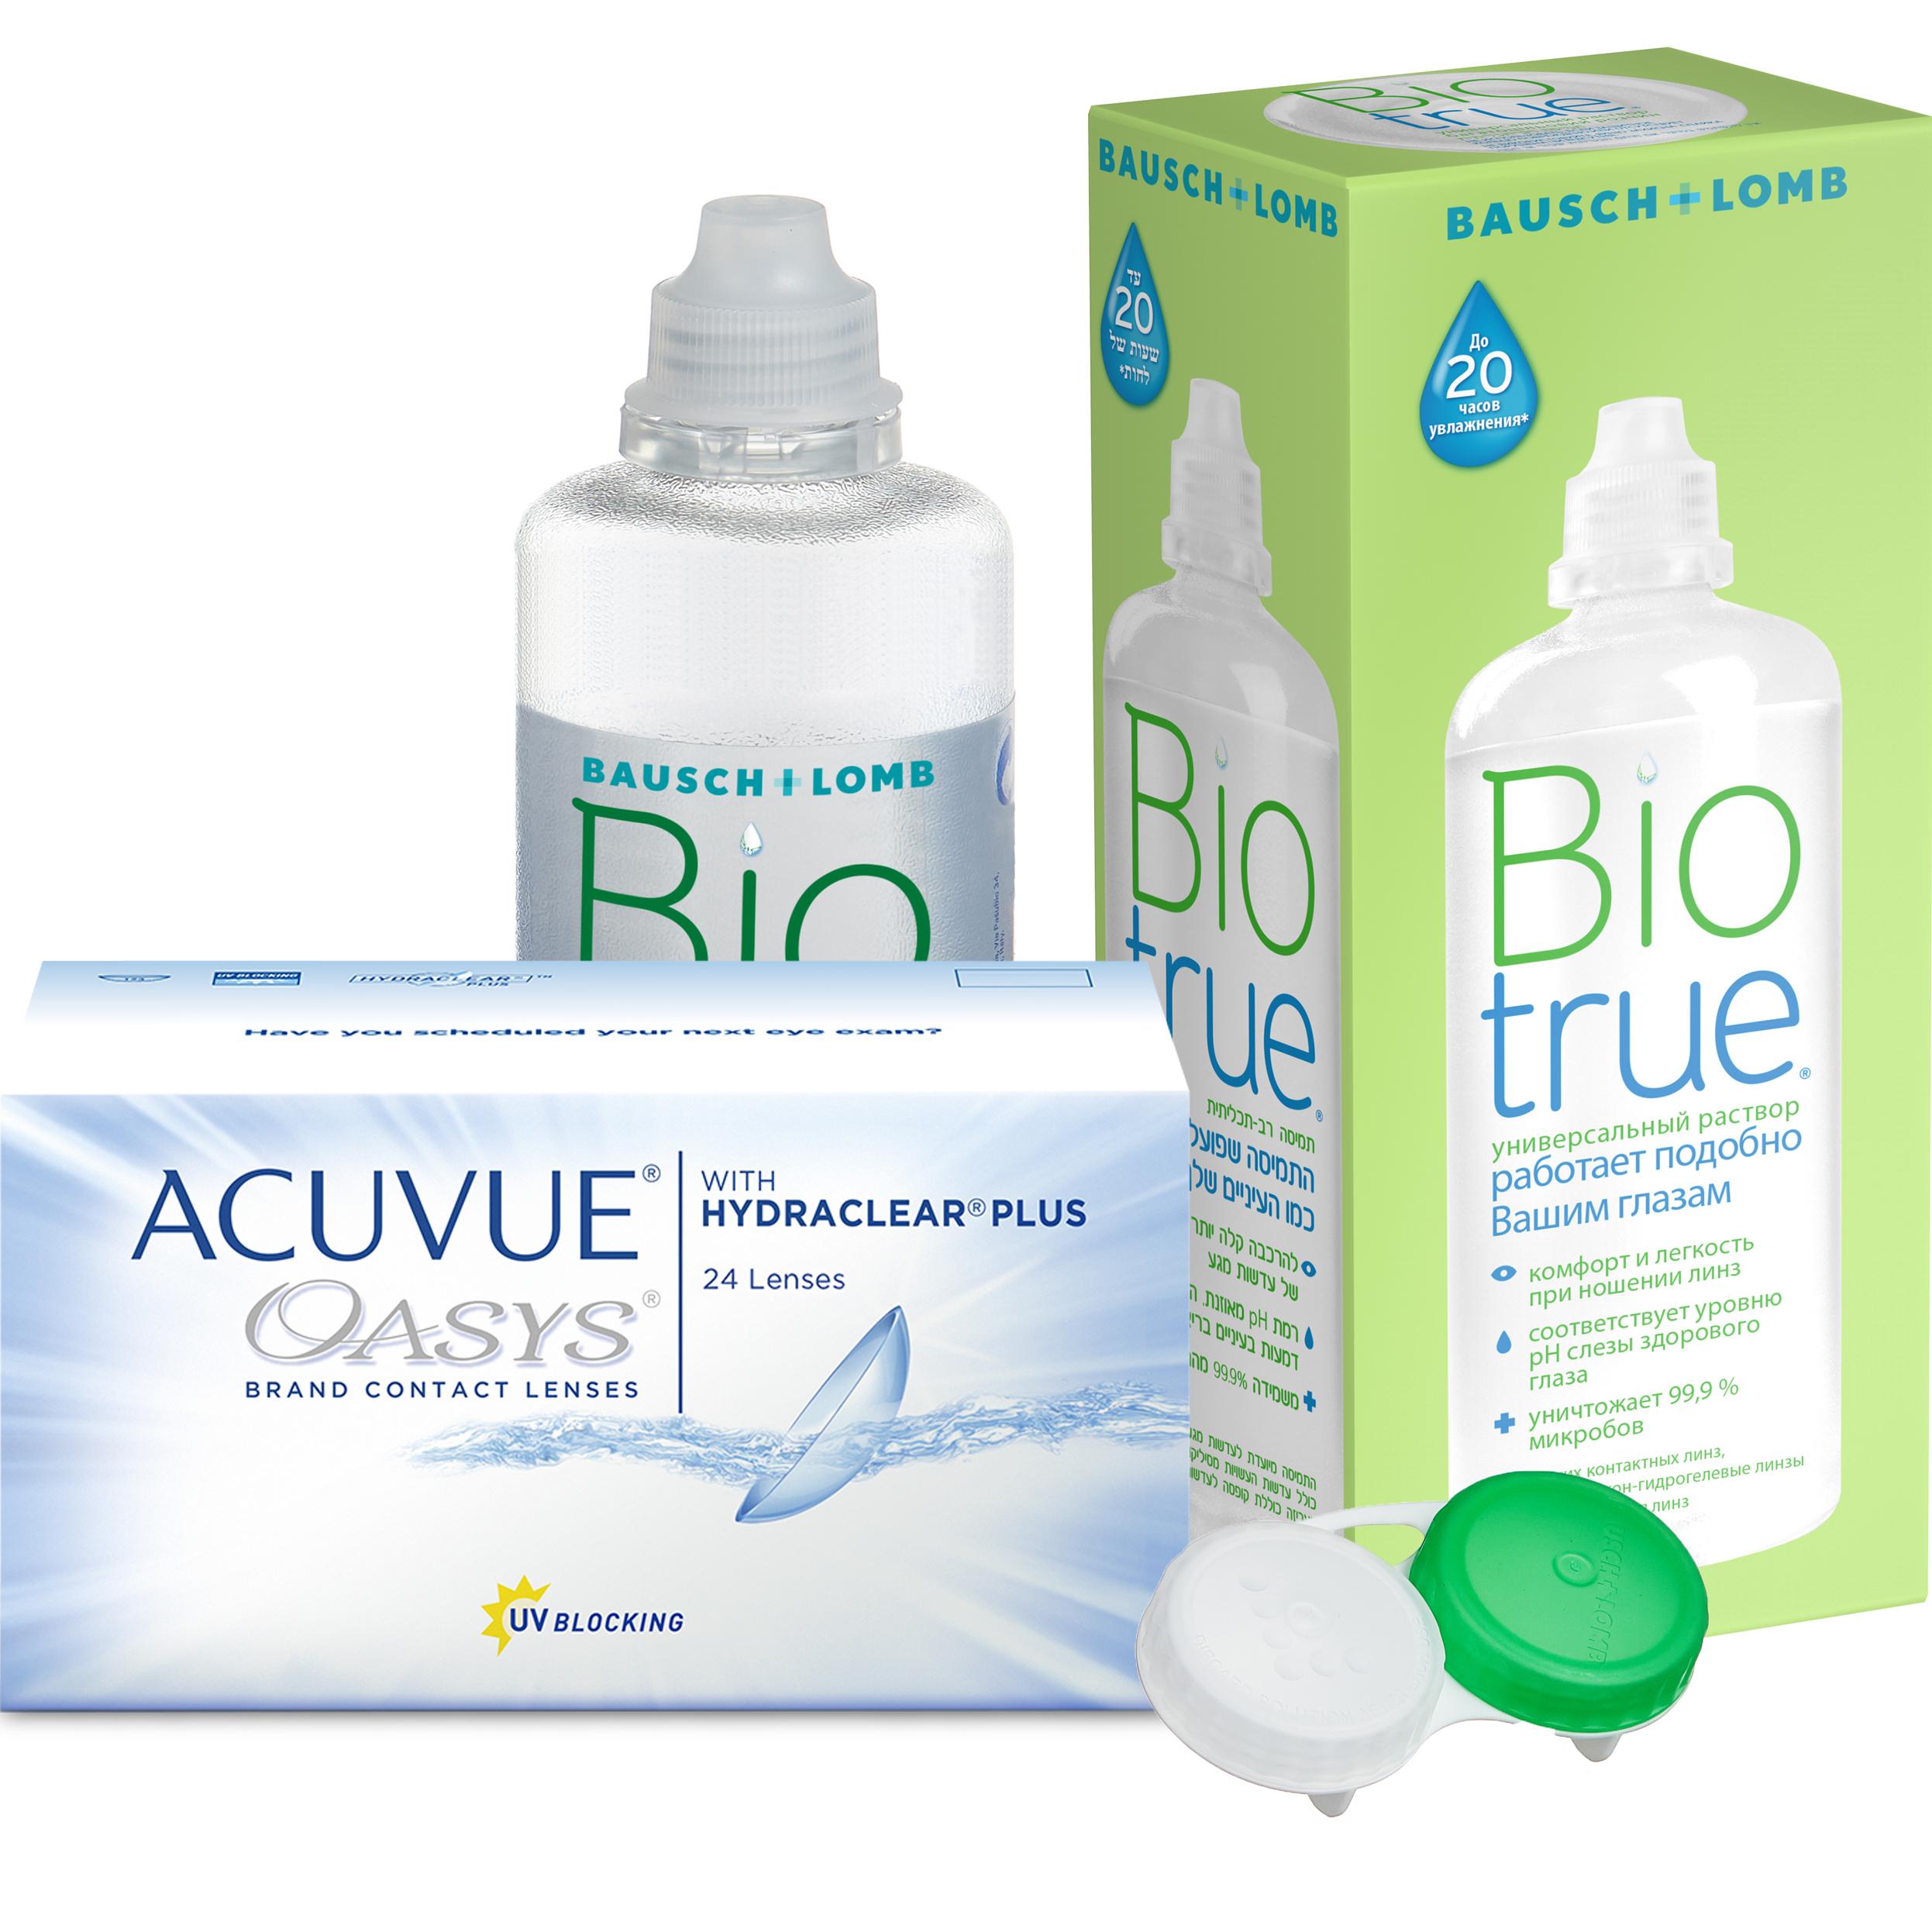 Купить Oasys with Hydraclear Plus 24 линзы + Biotrue, Контактные линзы Acuvue Oasys with Hydraclear Plus 24 линзы R 8.4 -4, 75 + Biotrue 300 мл